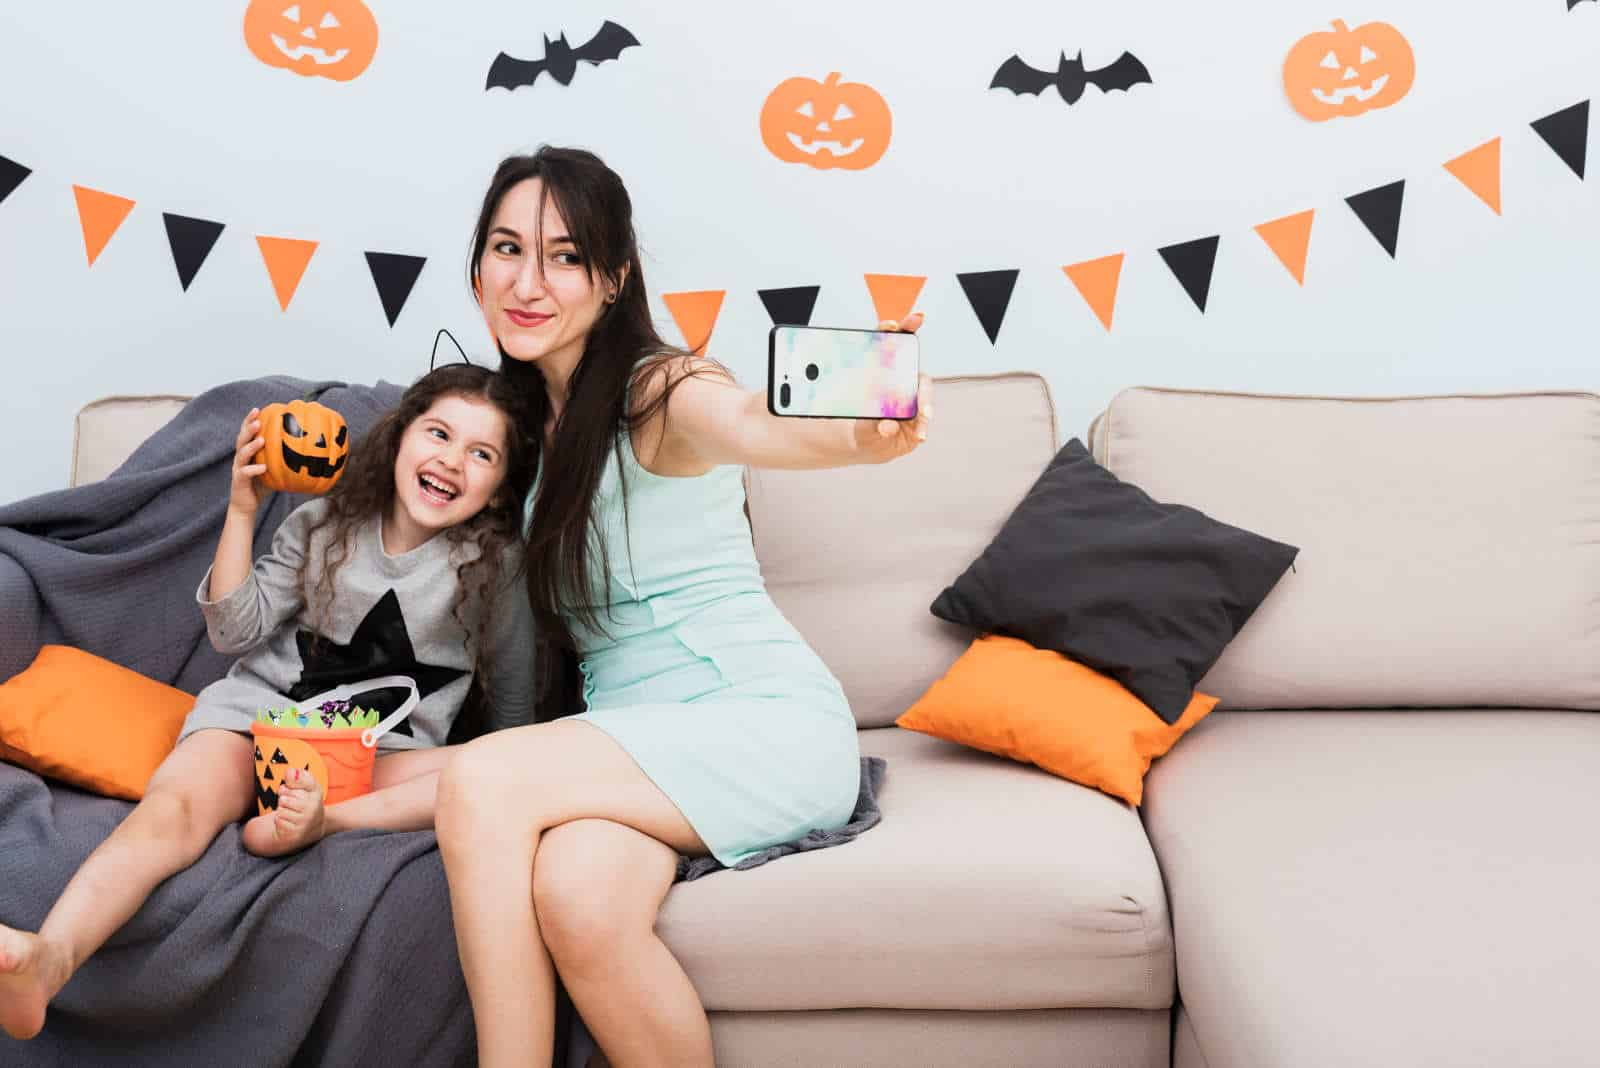 Evitar contagio piojos Halloween